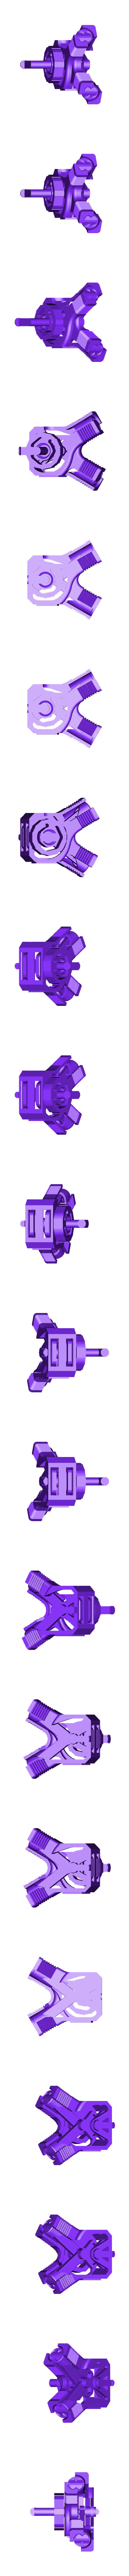 Skeletonized-V-twin with stem1.stl Download free STL file Skeletonized V-Twin! • Object to 3D print, SunShine